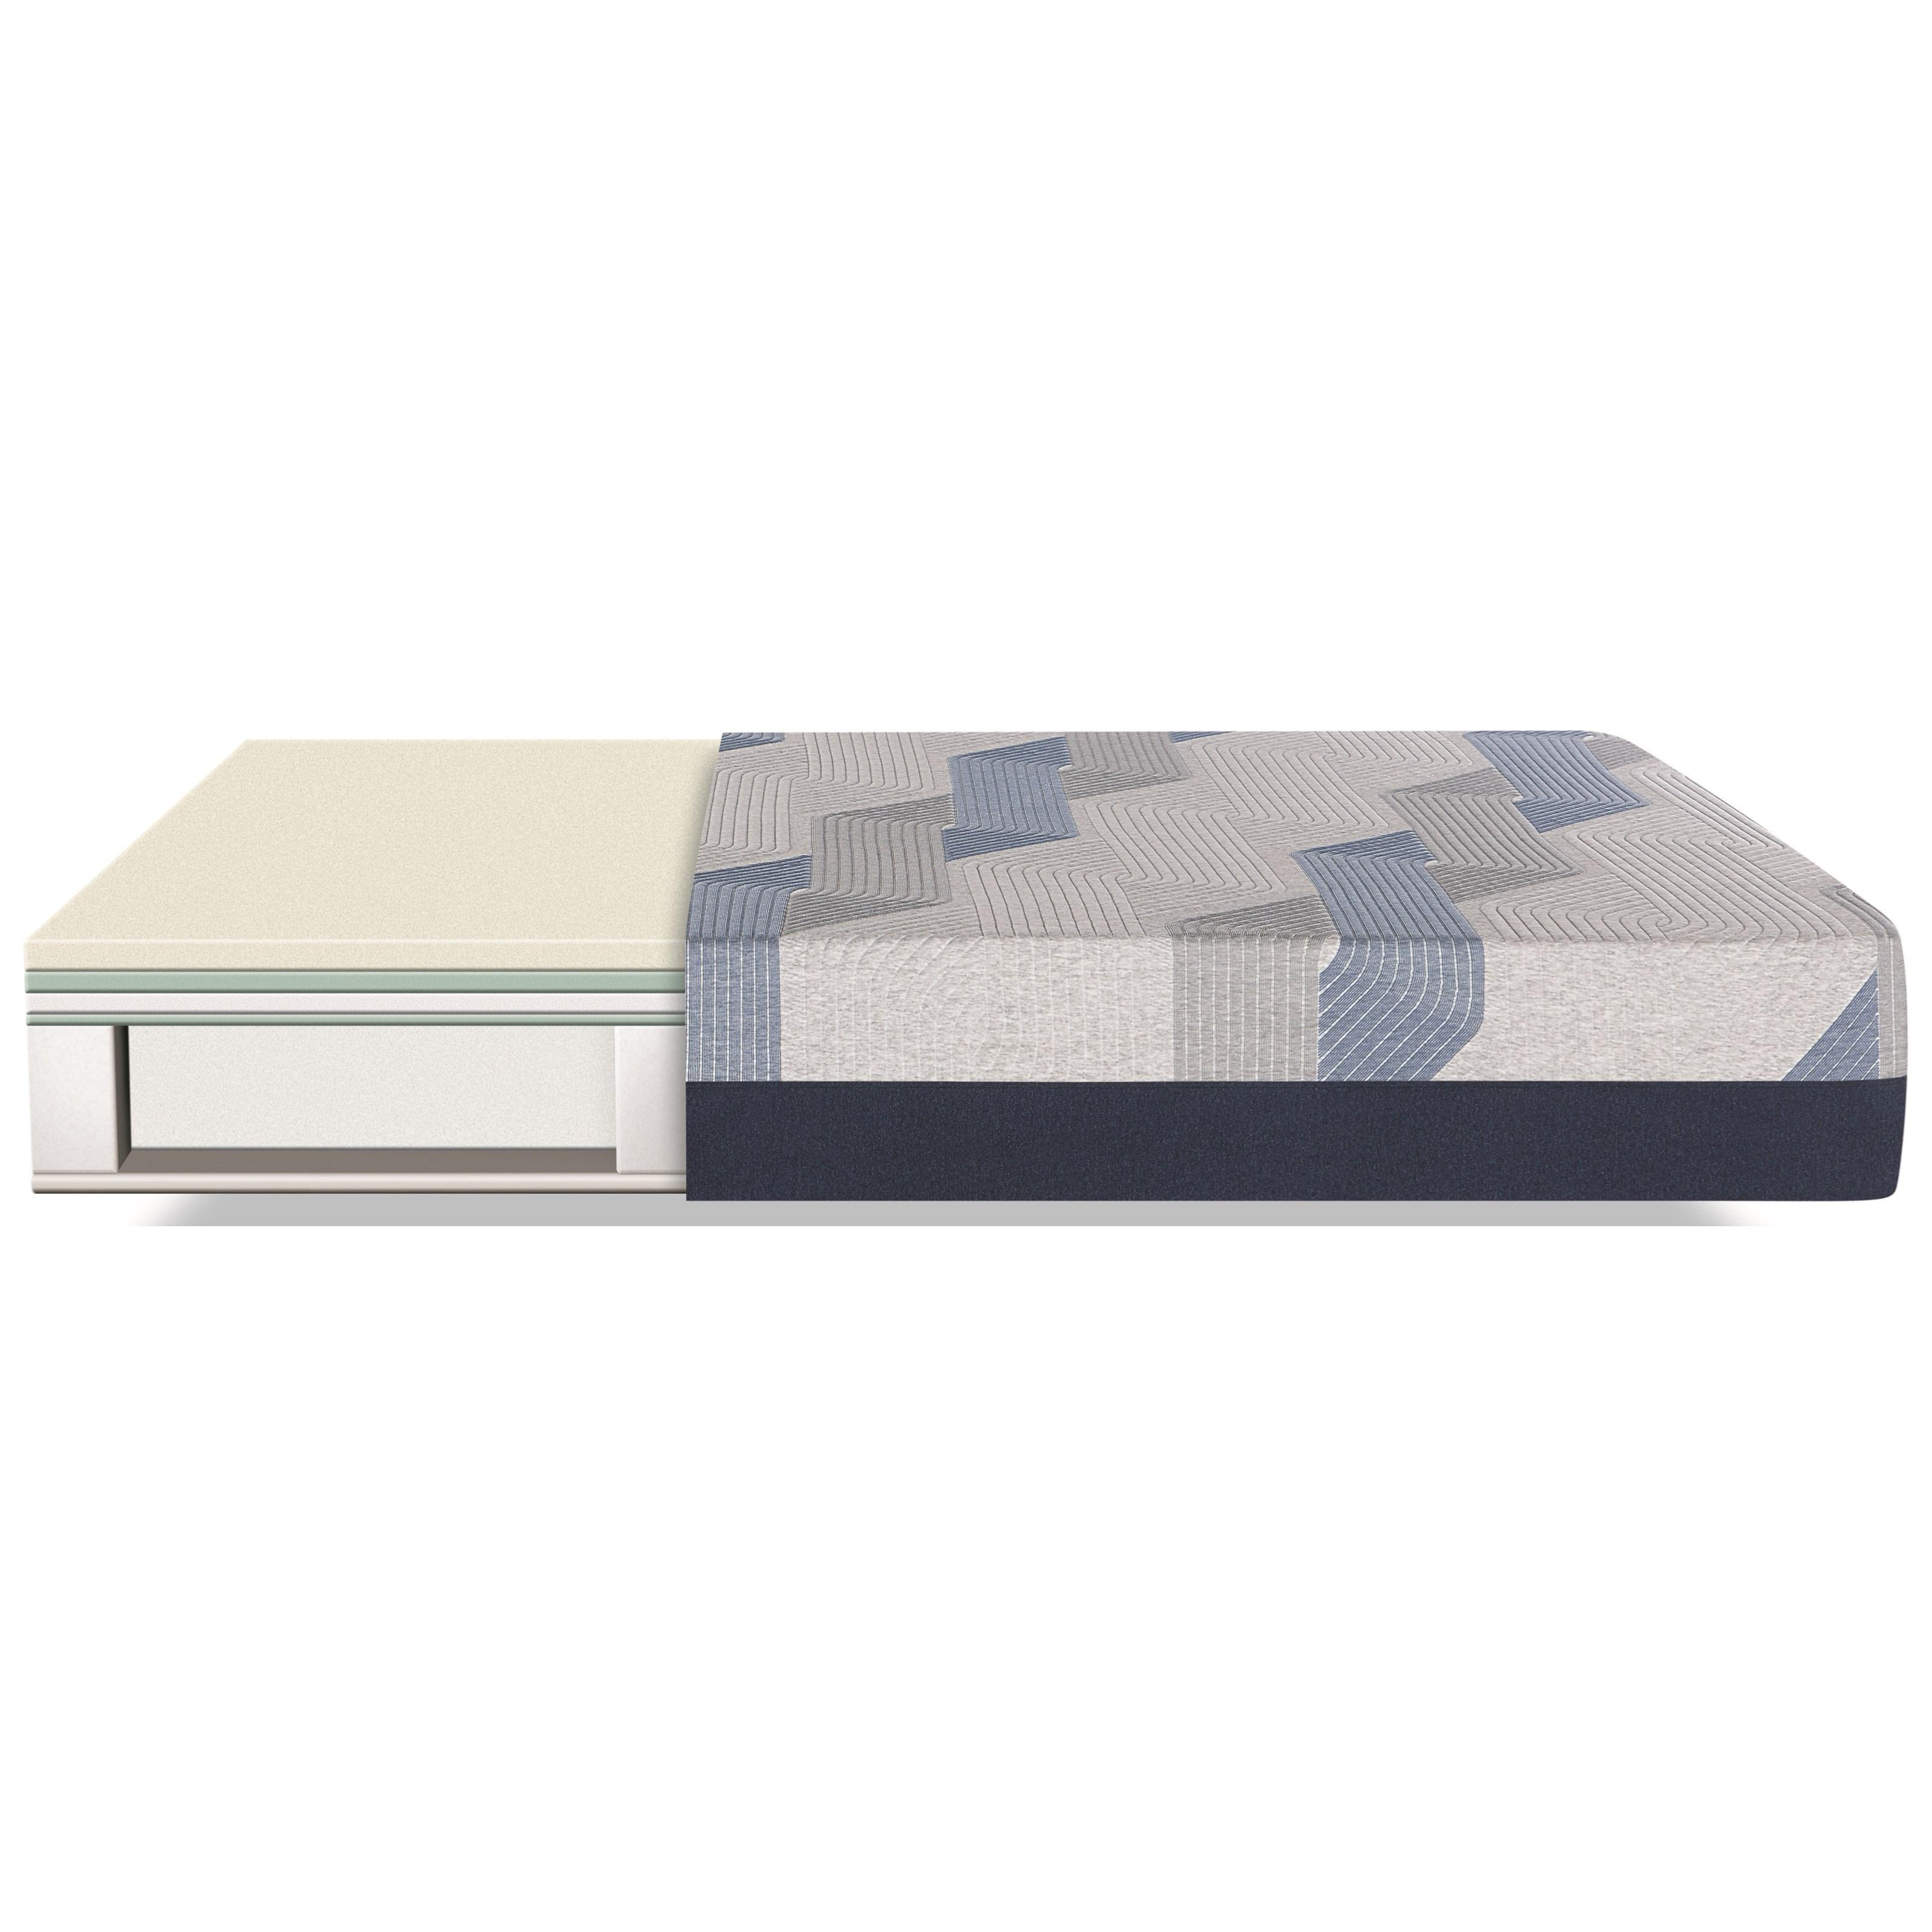 Serta Blue 300ct Firm 2019 King Firm Memory Foam Mattress